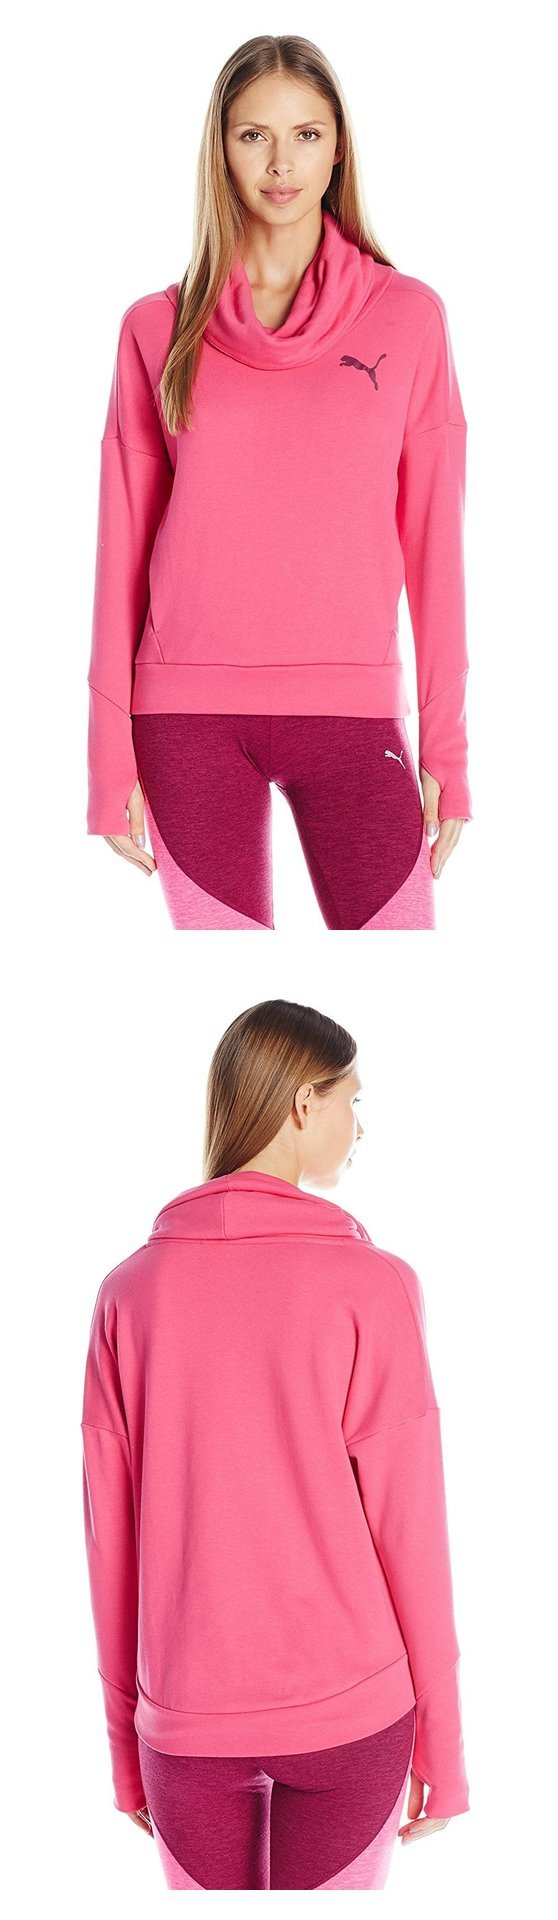 $22.56 - PUMA Women's Elevated Rollneck Sweat W Fuchsia Purple #puma